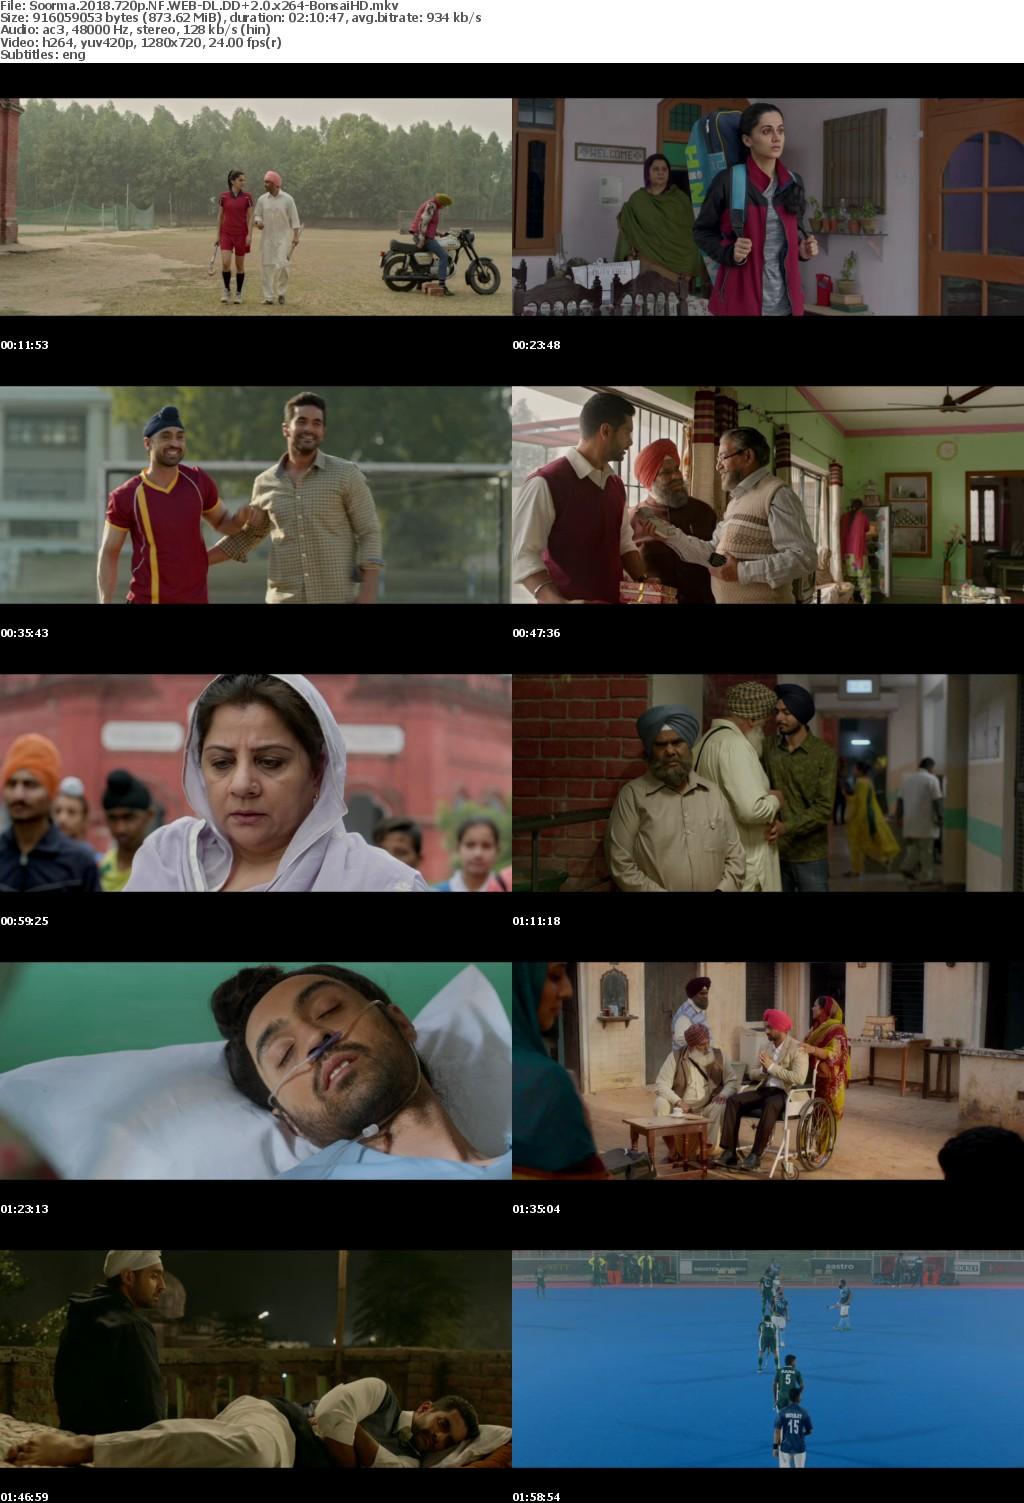 Soorma (2018) Hindi 720p NF WEB-DL - 870 MB - 2CH ESub x264 - Shadow (BonsaiHD)